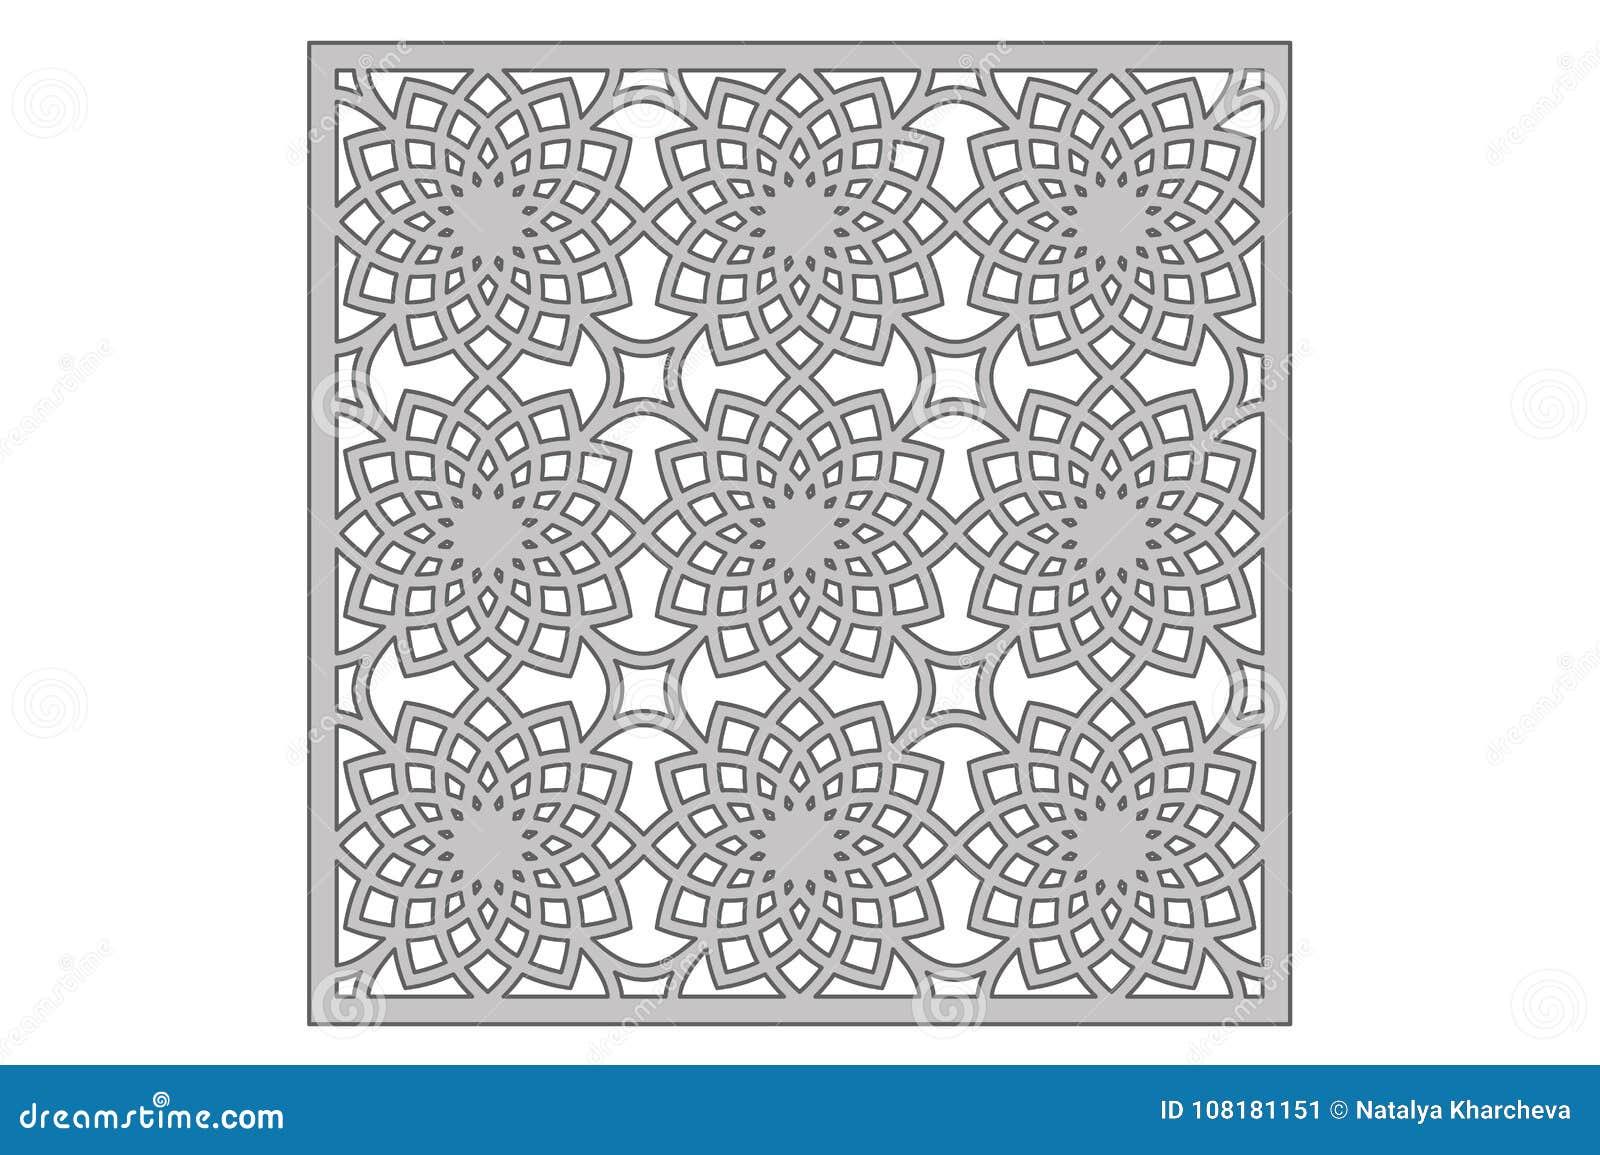 Template For Cutting. Geometric Flower Pattern. Laser Cut. Ratio 1:1 ...